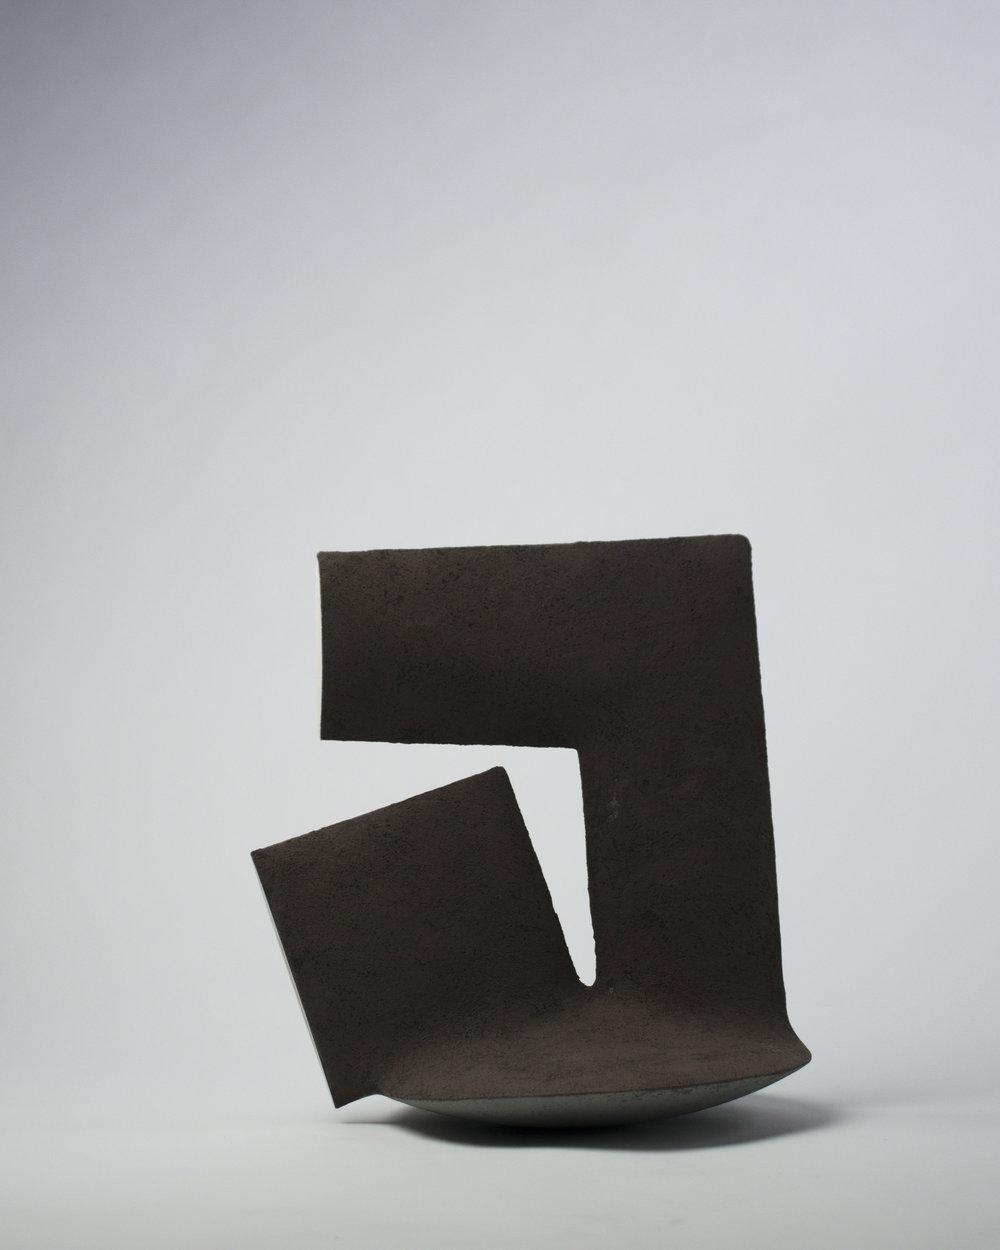 Figure #6, 2016 - 12 x 11 x 9 in